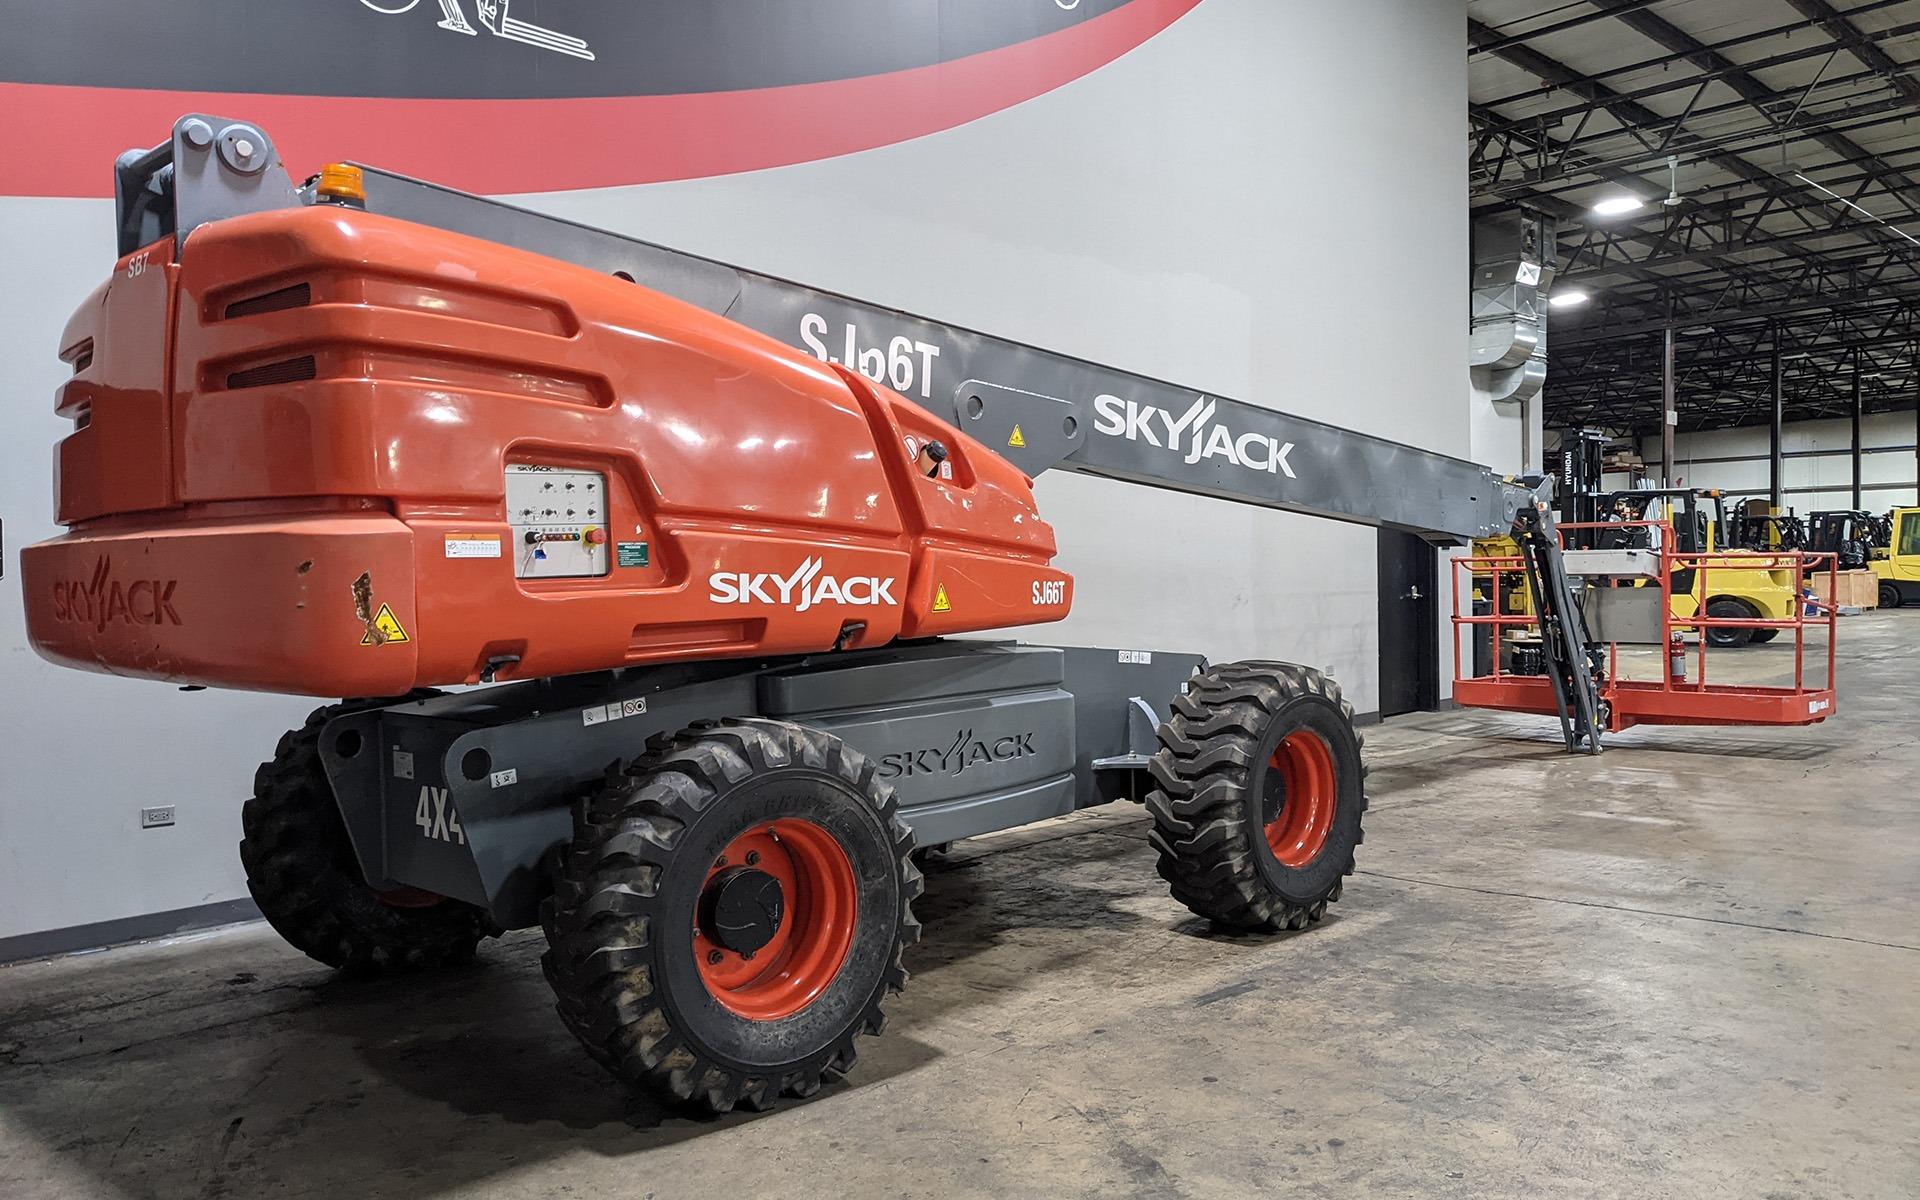 Used 2020 SKYJACK SJ66T  | Cary, IL